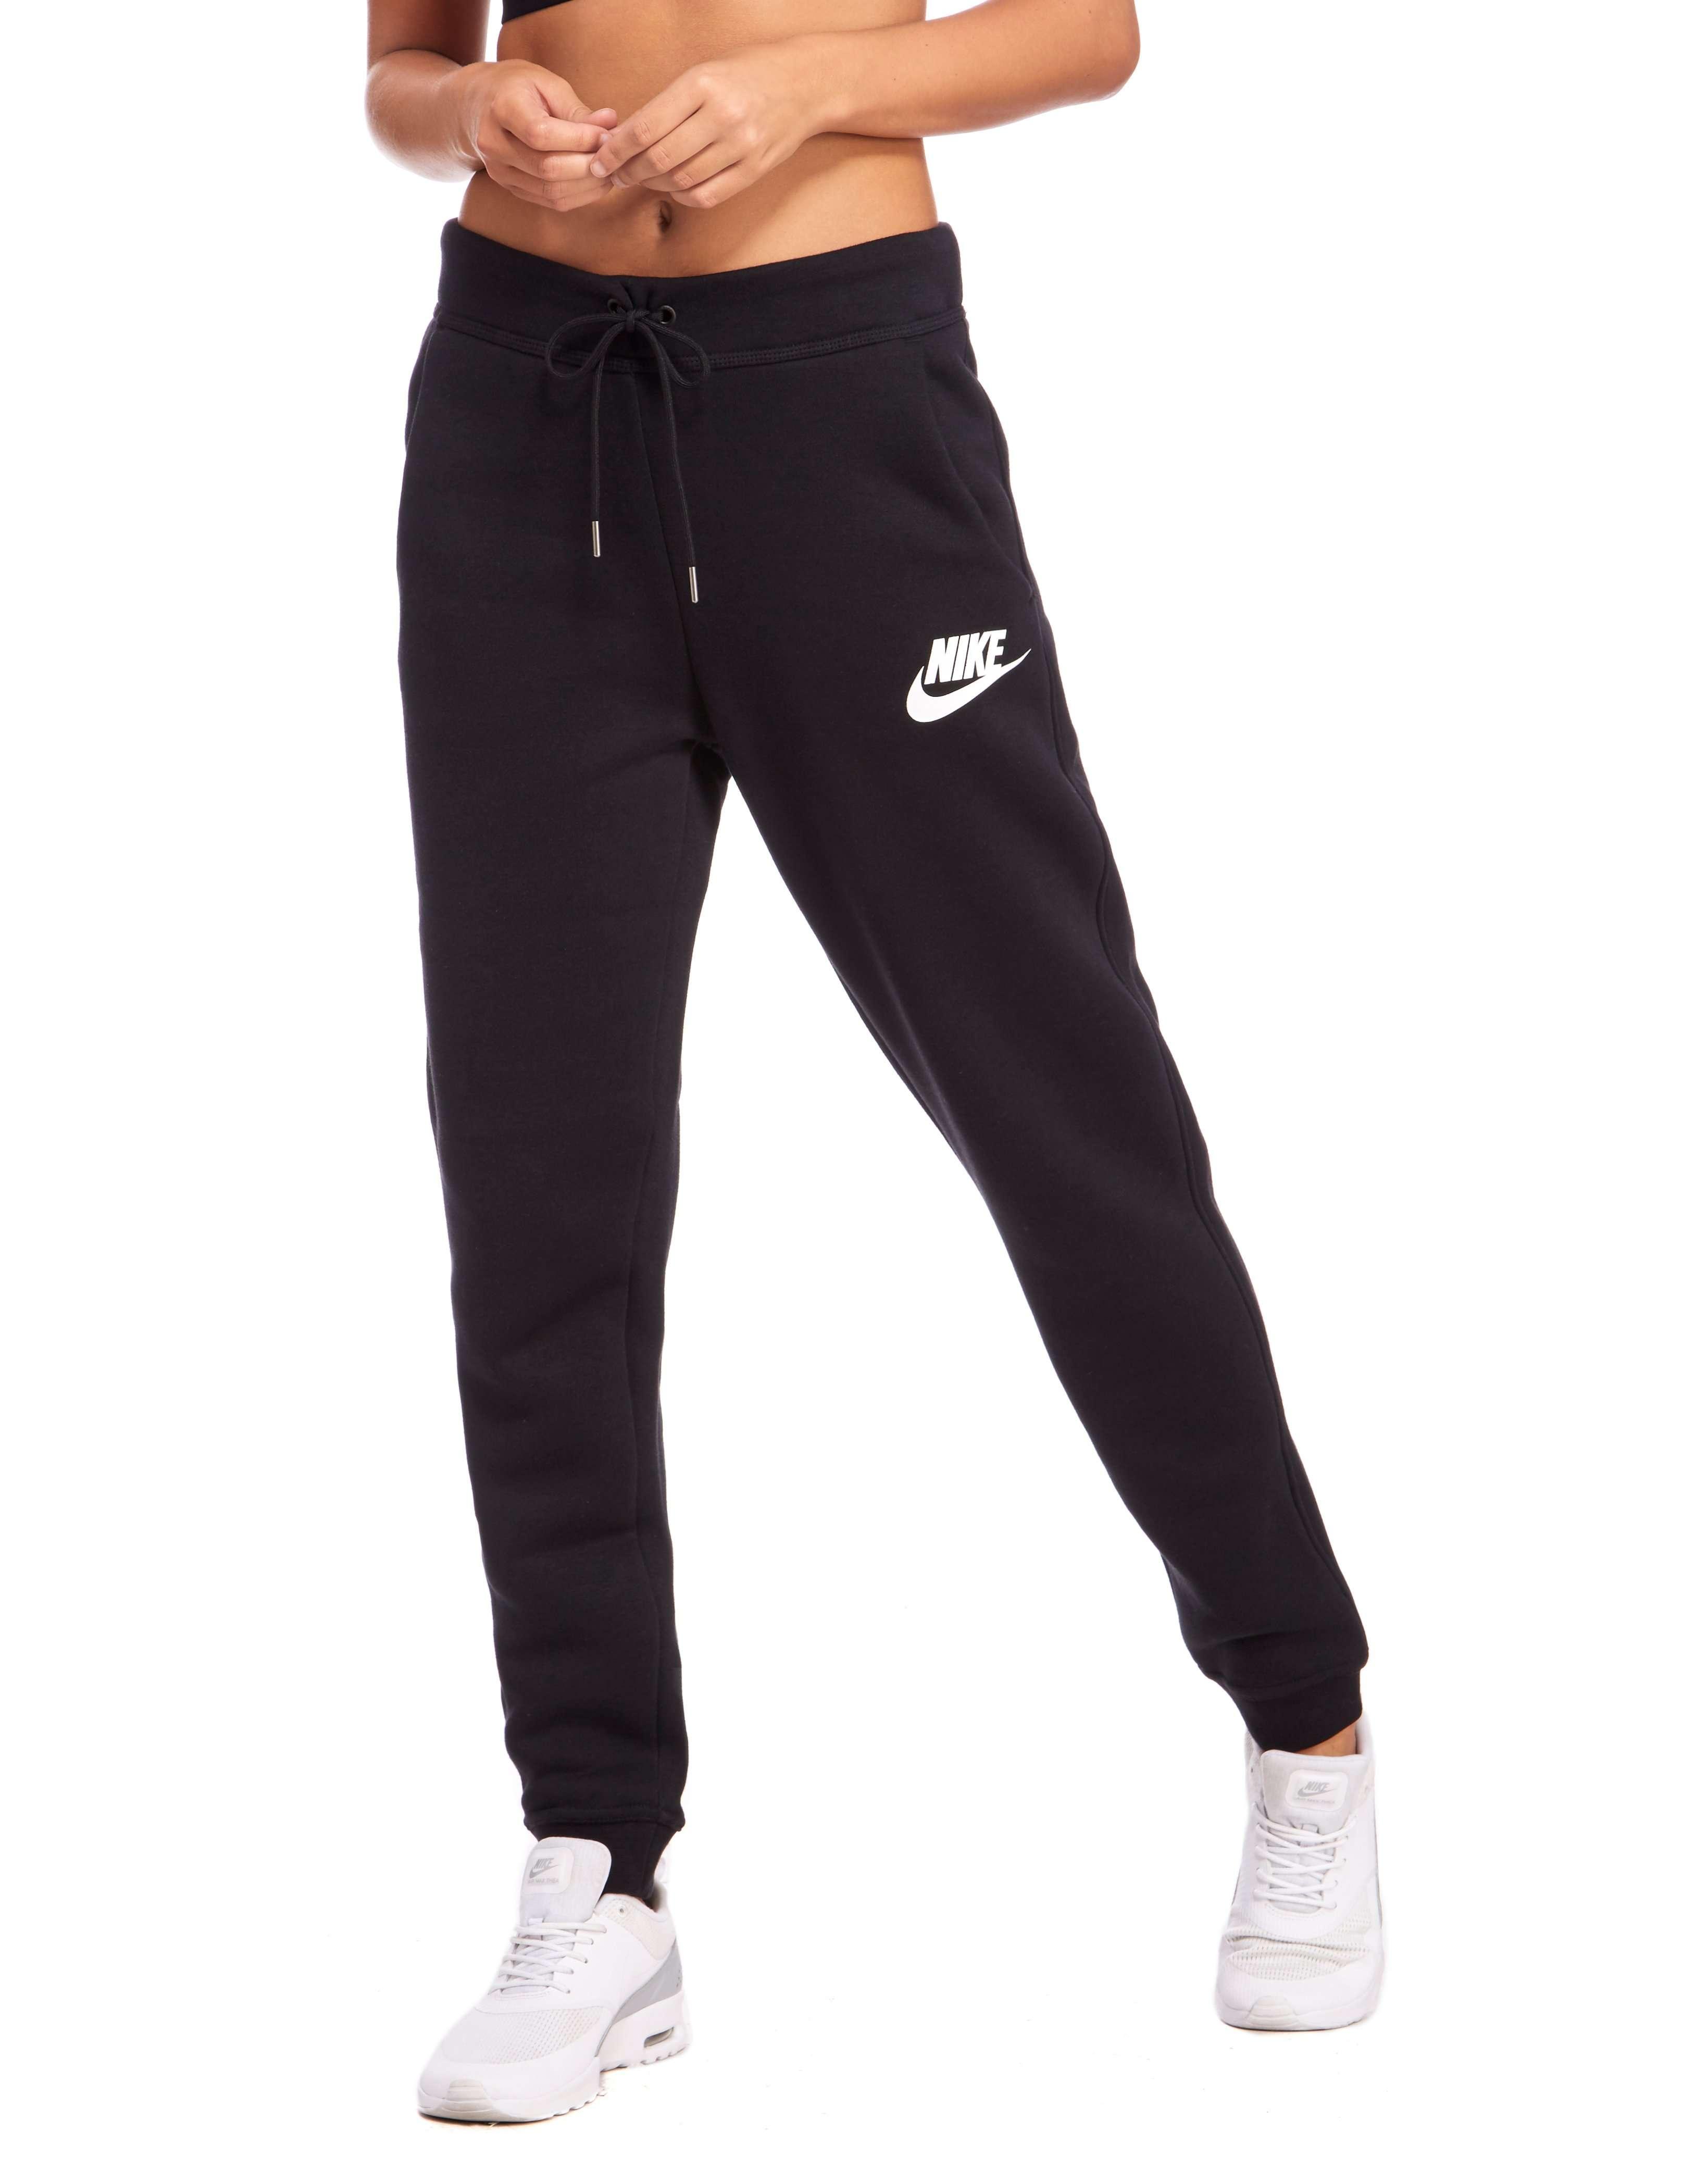 Luxury Nike All Time ThermaFIT SweatPants  Pants  Women  Macy39s